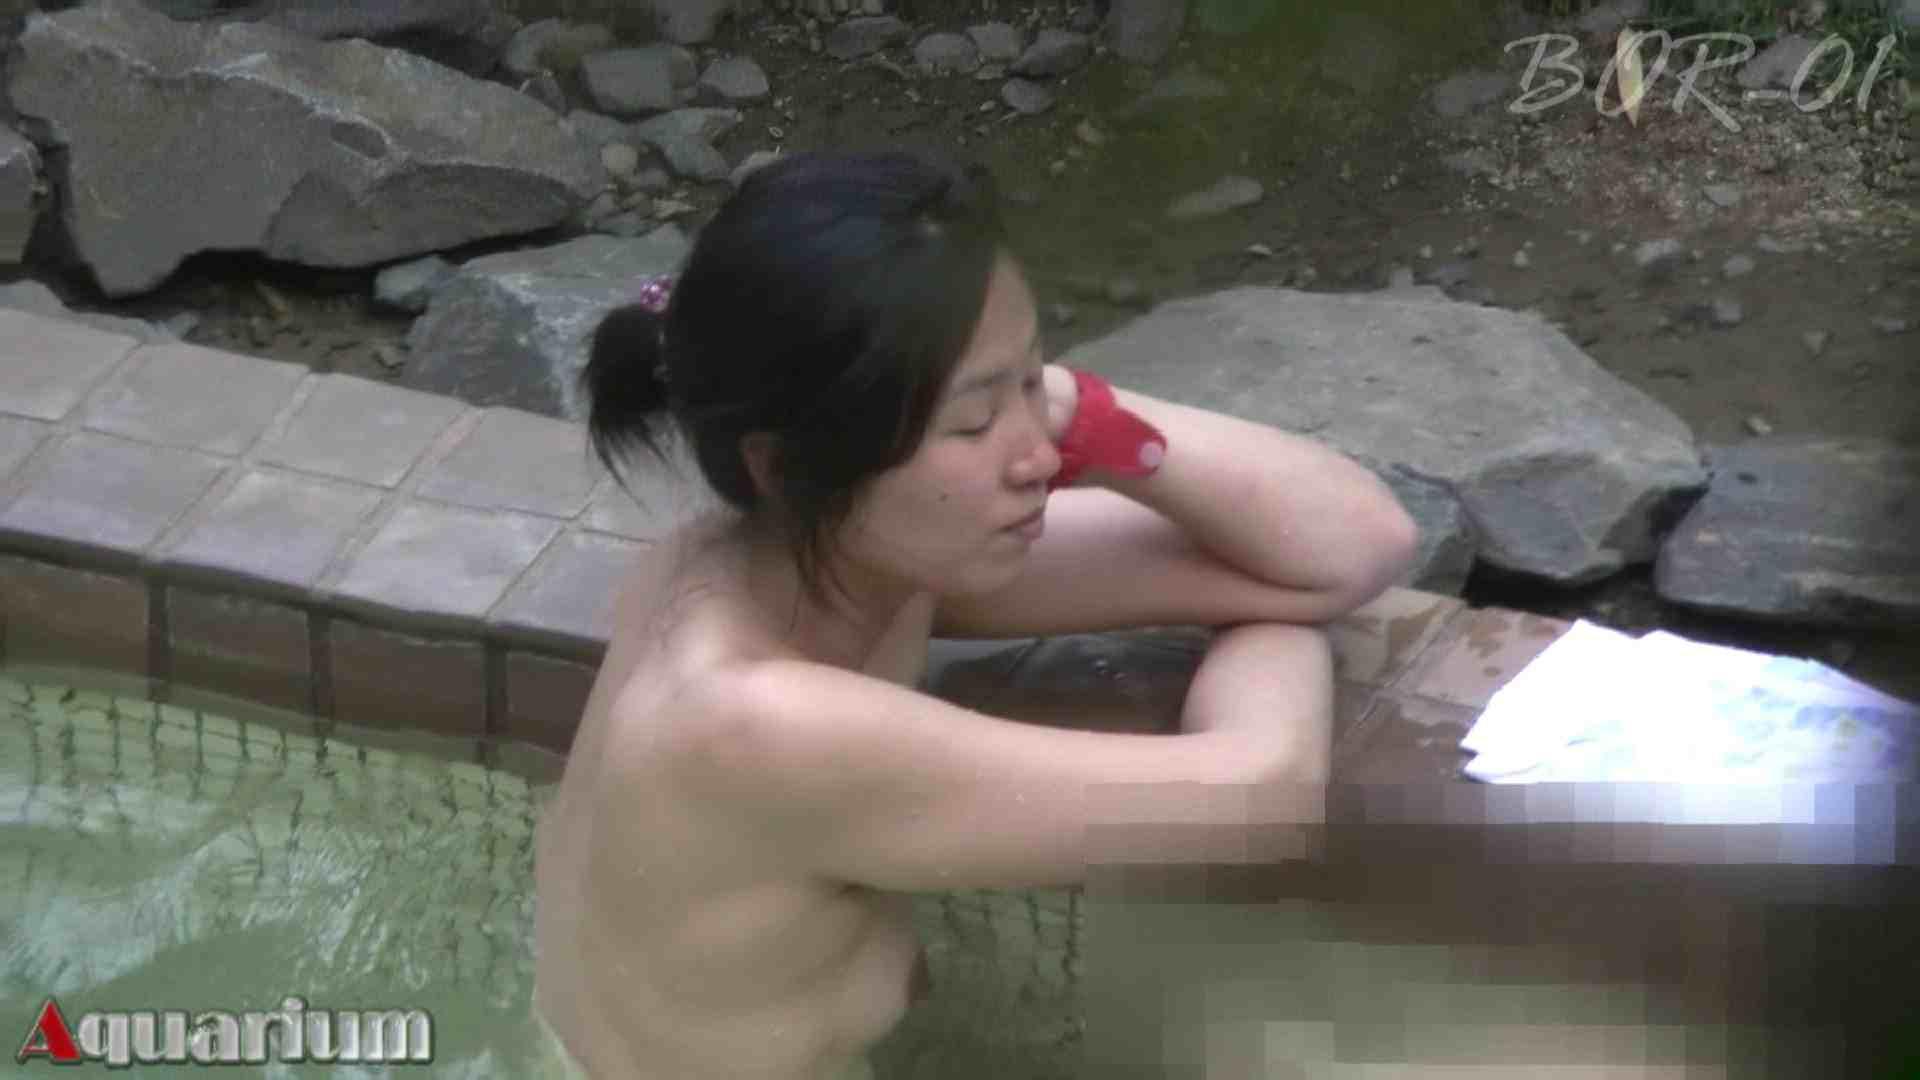 Aquaな露天風呂Vol.465 美しいOLの裸体 おめこ無修正動画無料 103pic 23